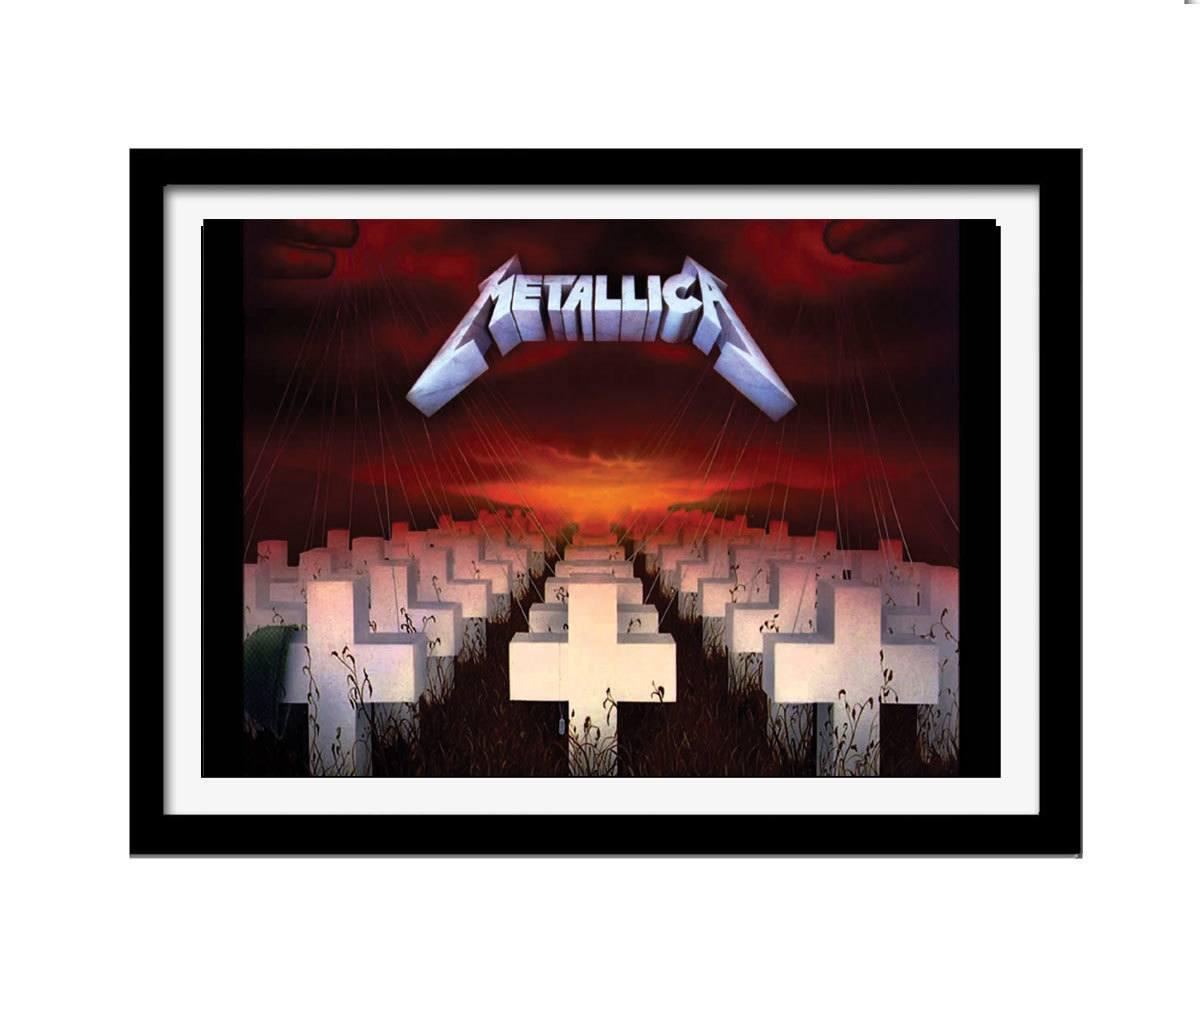 Quadro Metallica mdf 33x25 moldura preto